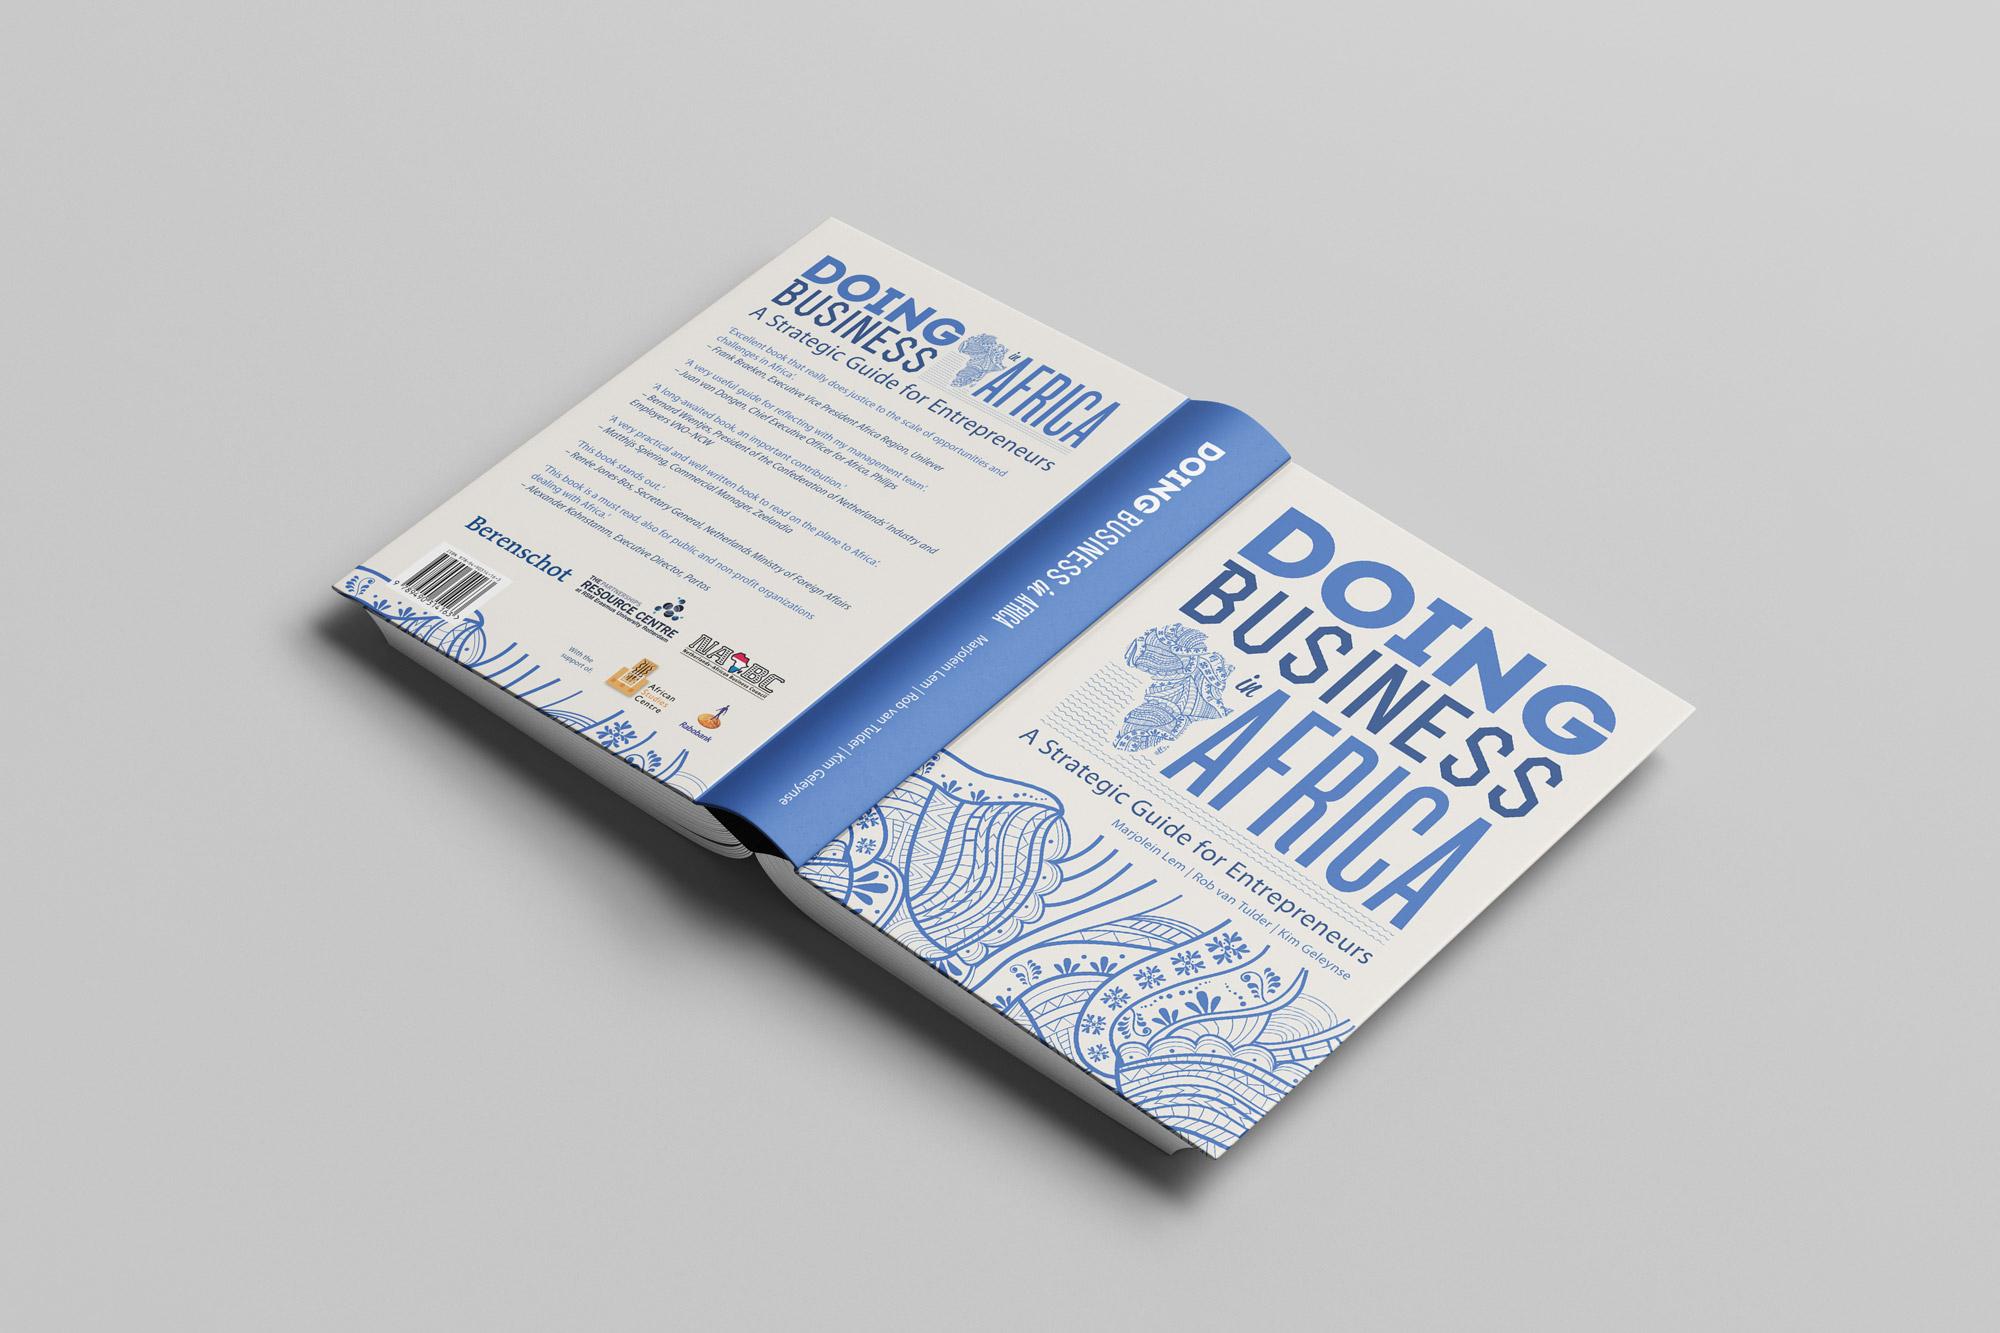 book cover design africa